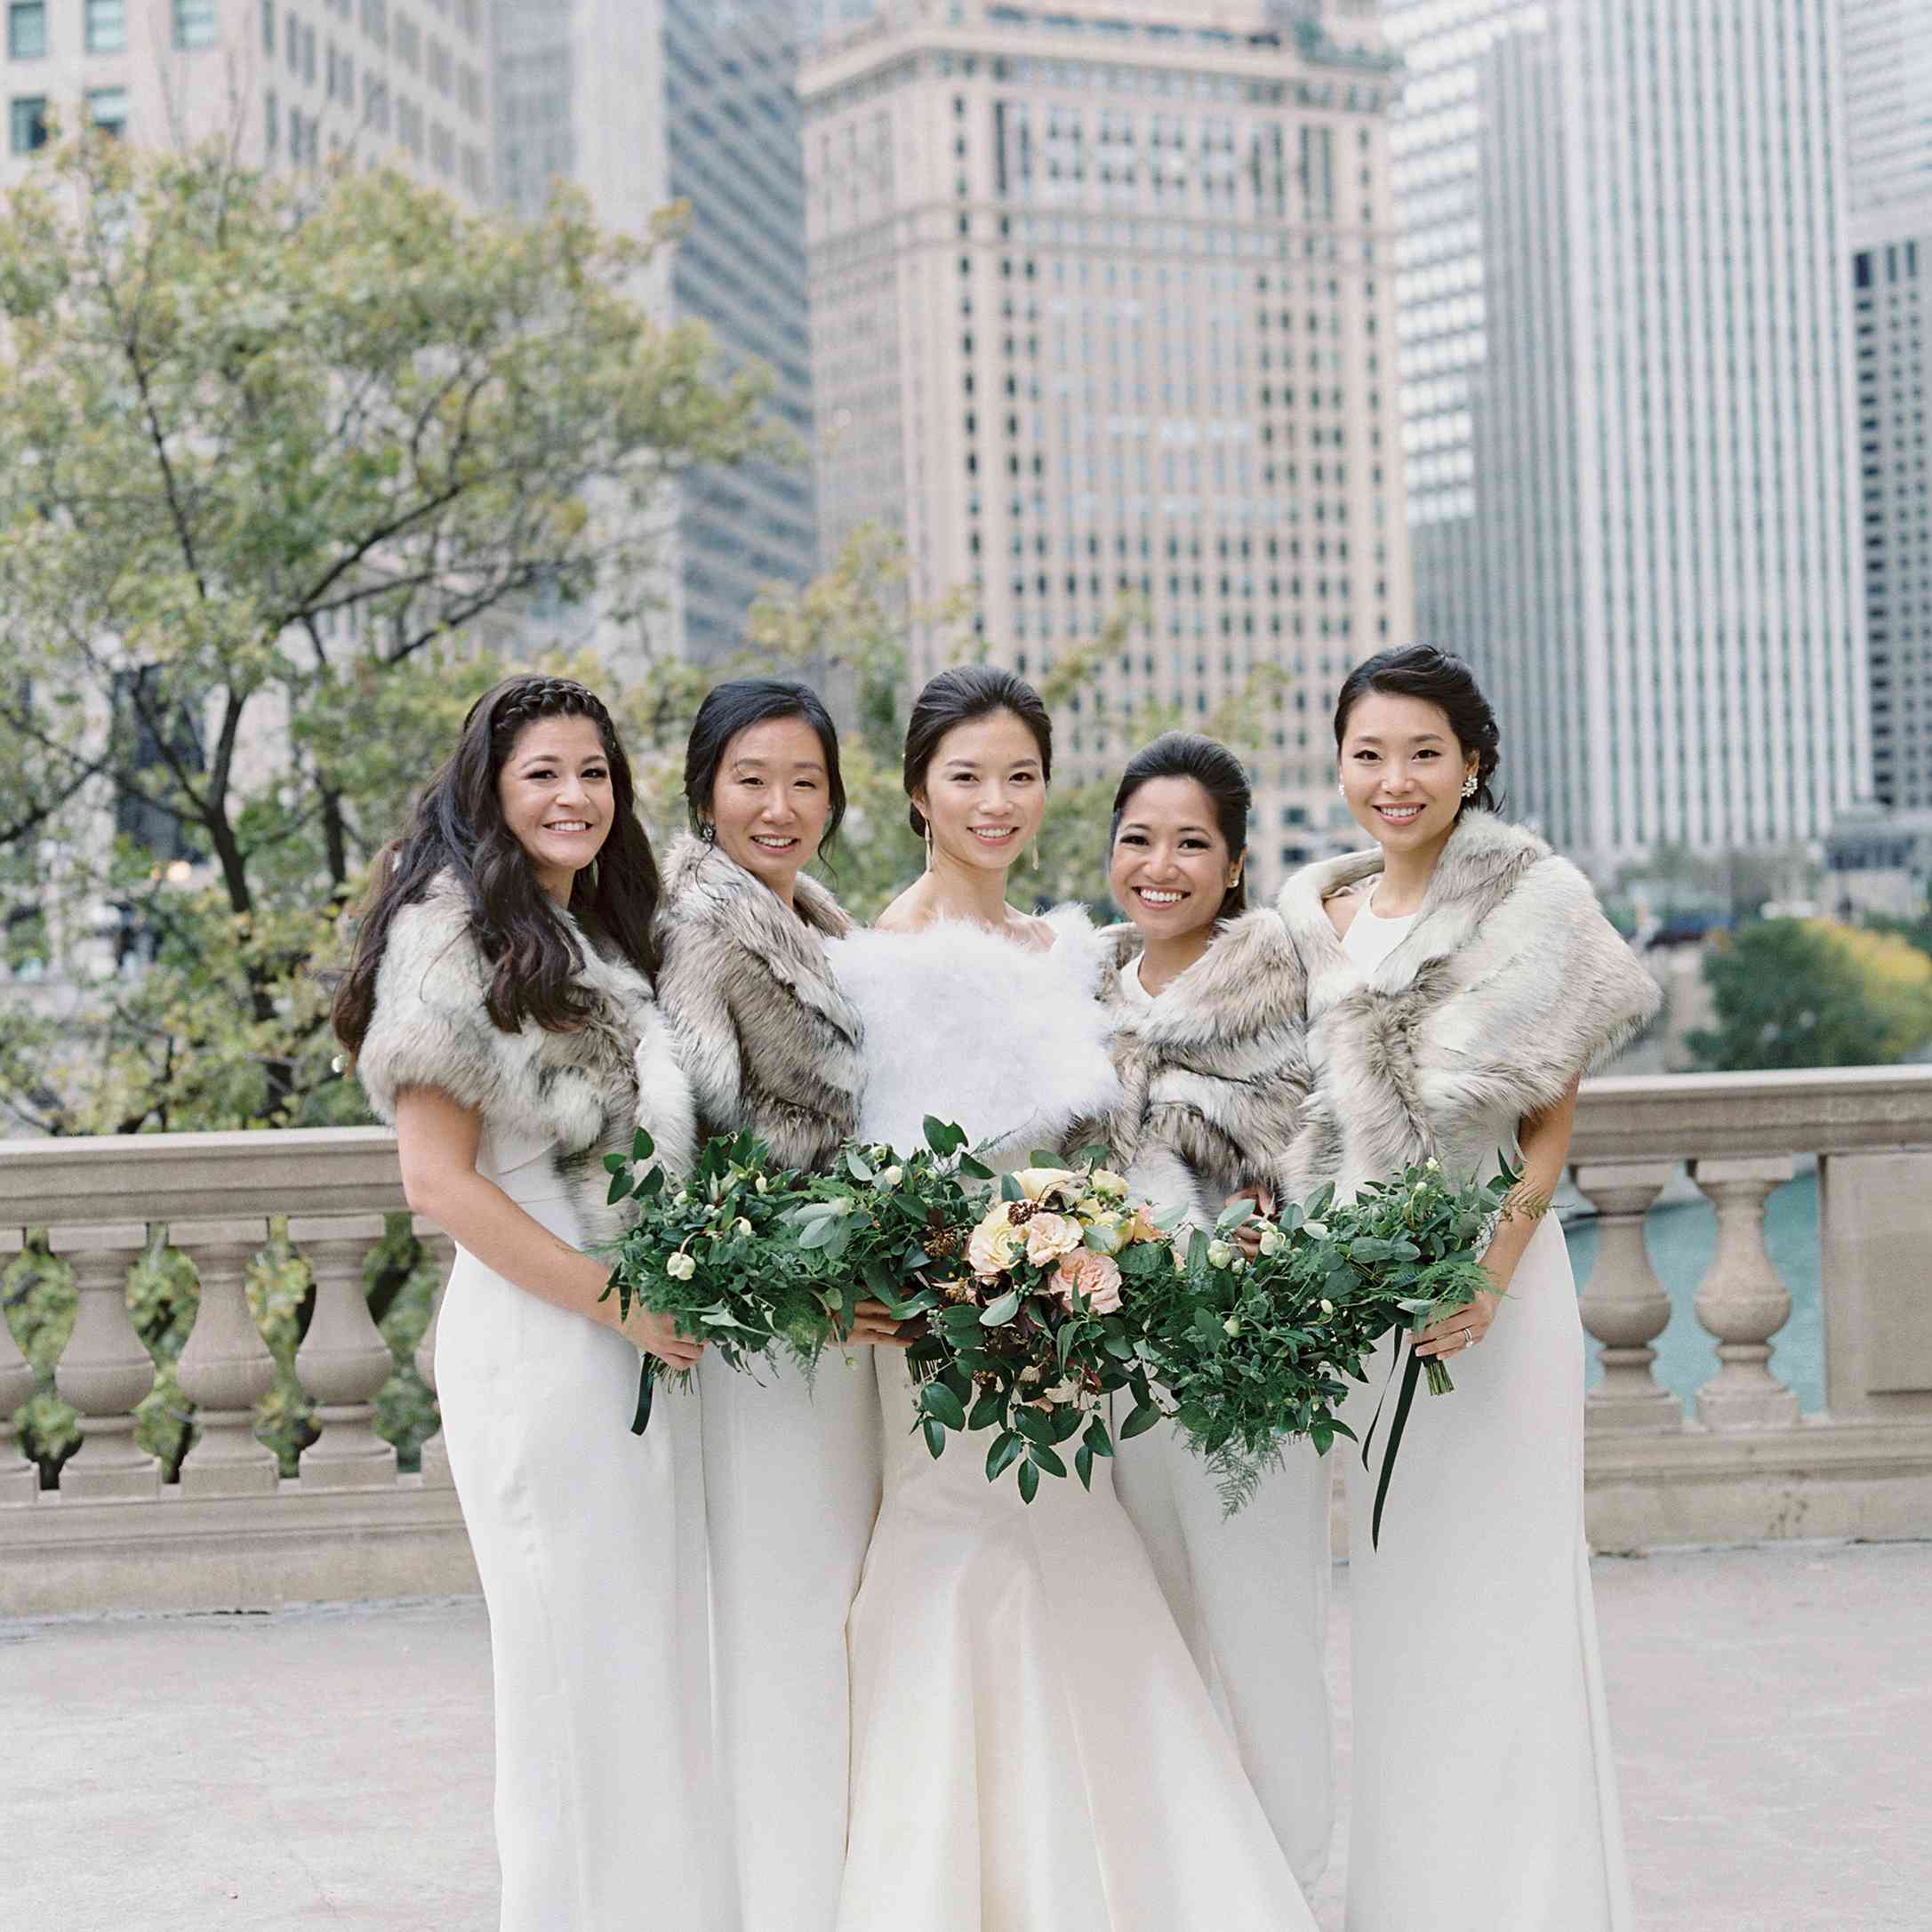 Bride with bridesmaids in faux fur wraps